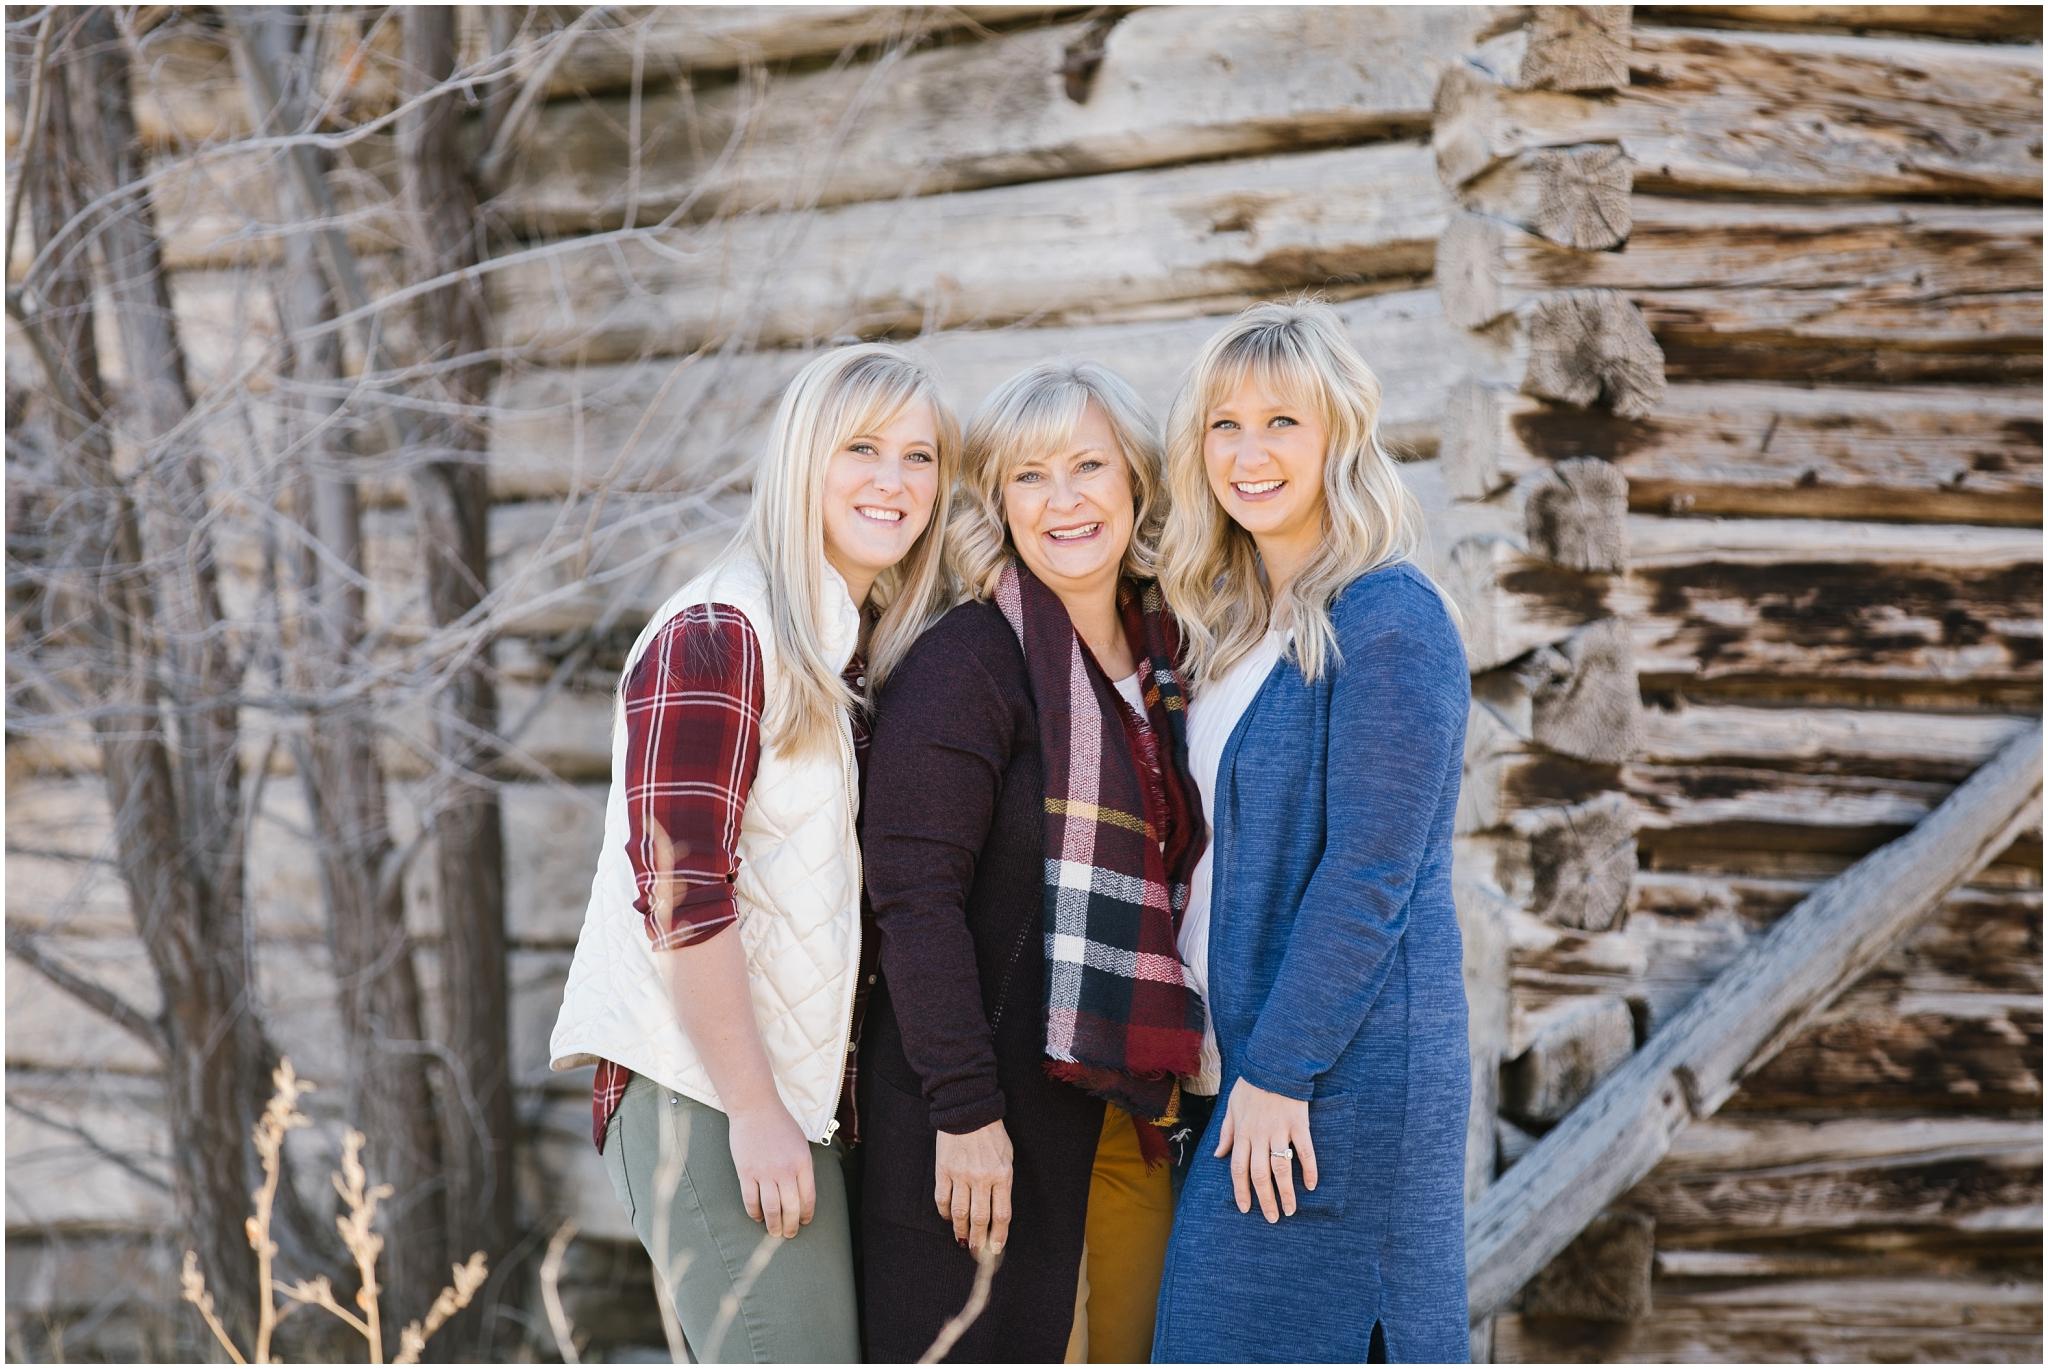 Laws-54_Lizzie-B-Imagery-Utah-Family-Photographer-Salt-Lake-City-Park-City-Davis-County-Clearfield.jpg